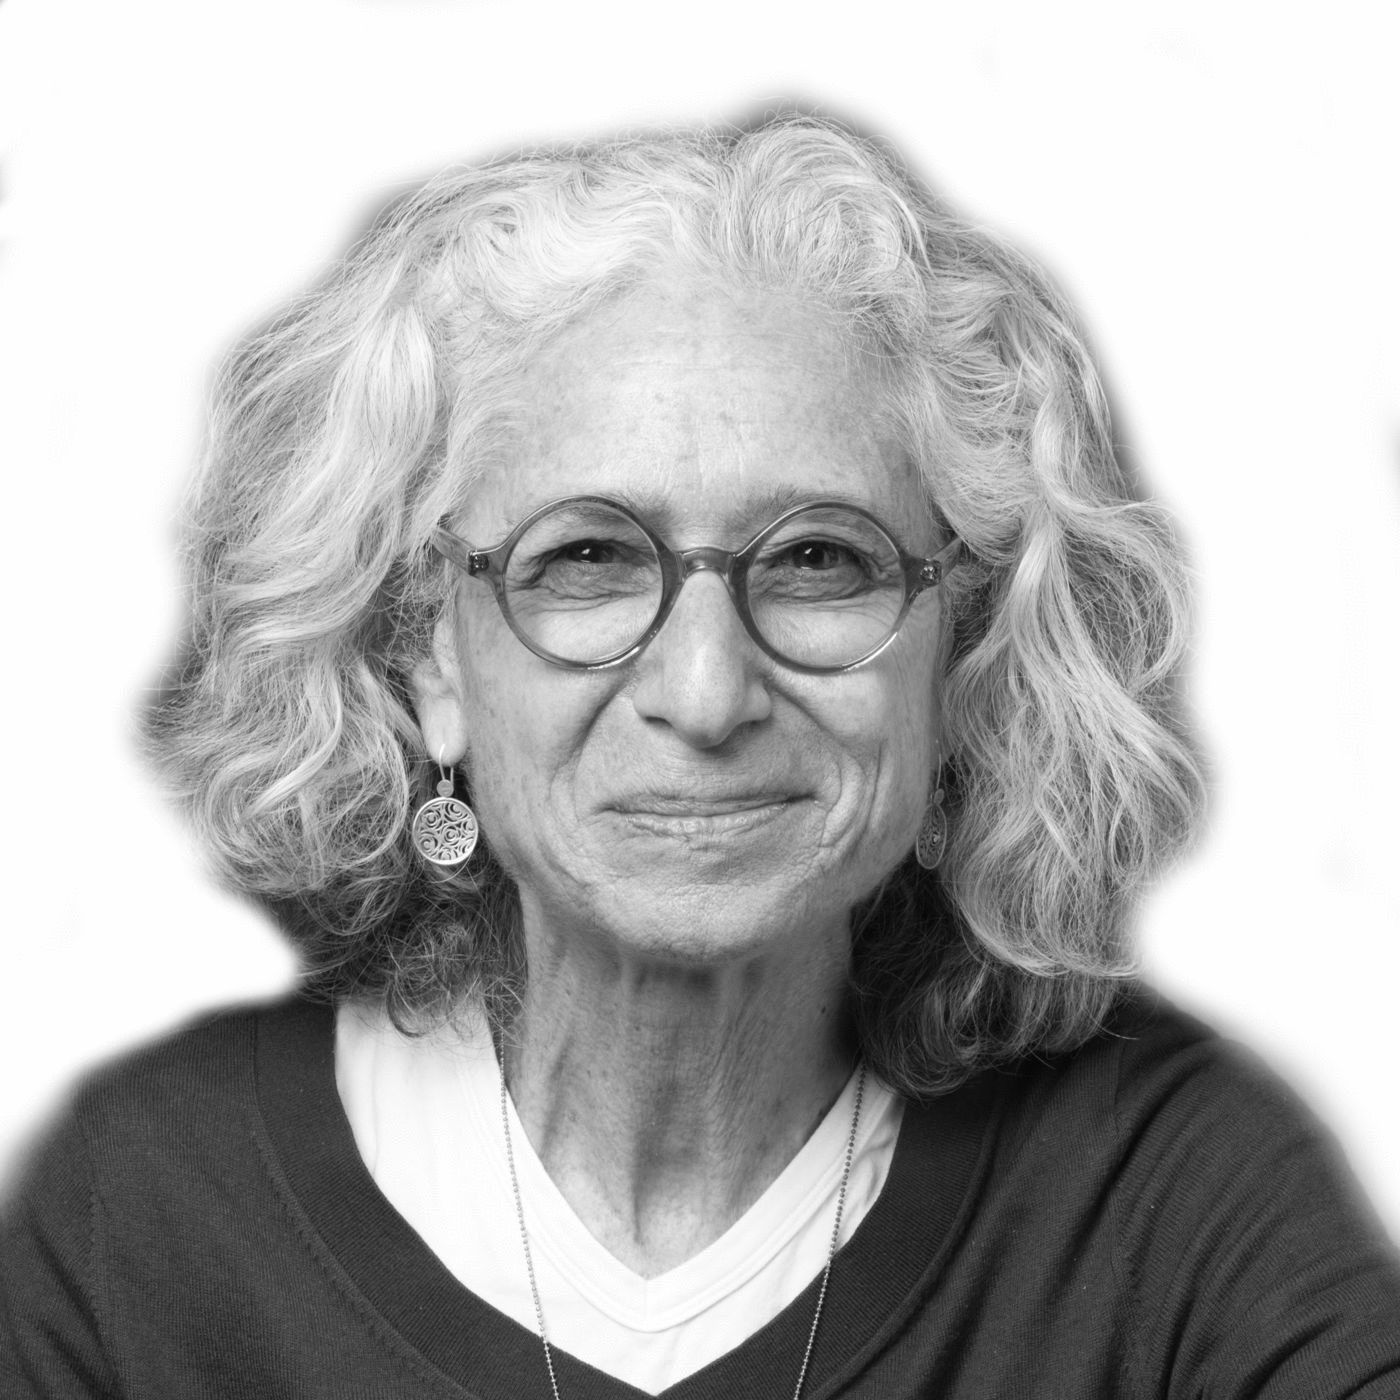 Dr. Jane Aronson